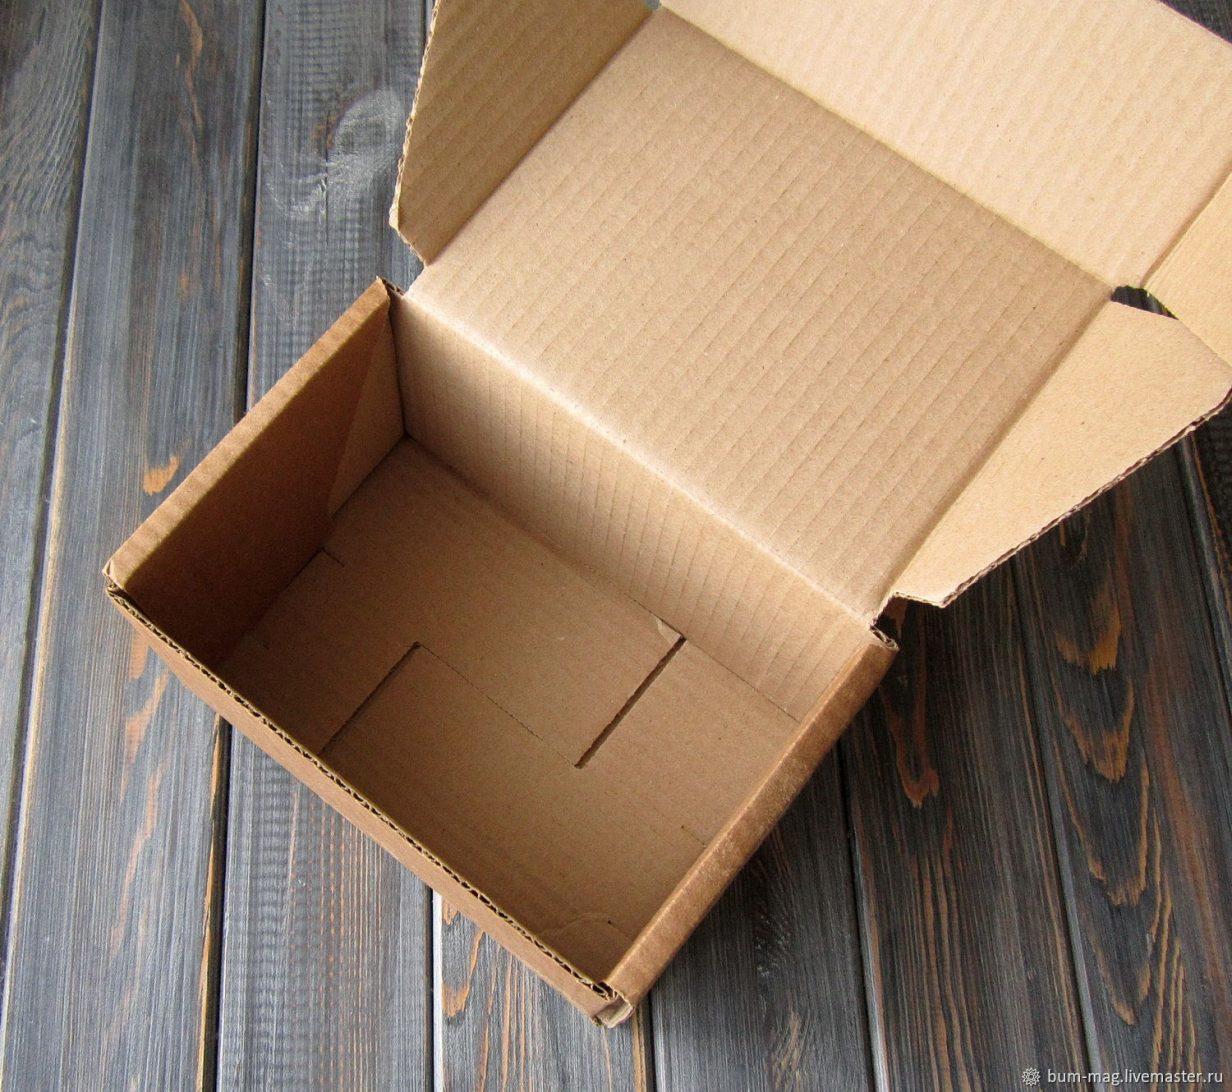 Маленькие коробки для почты